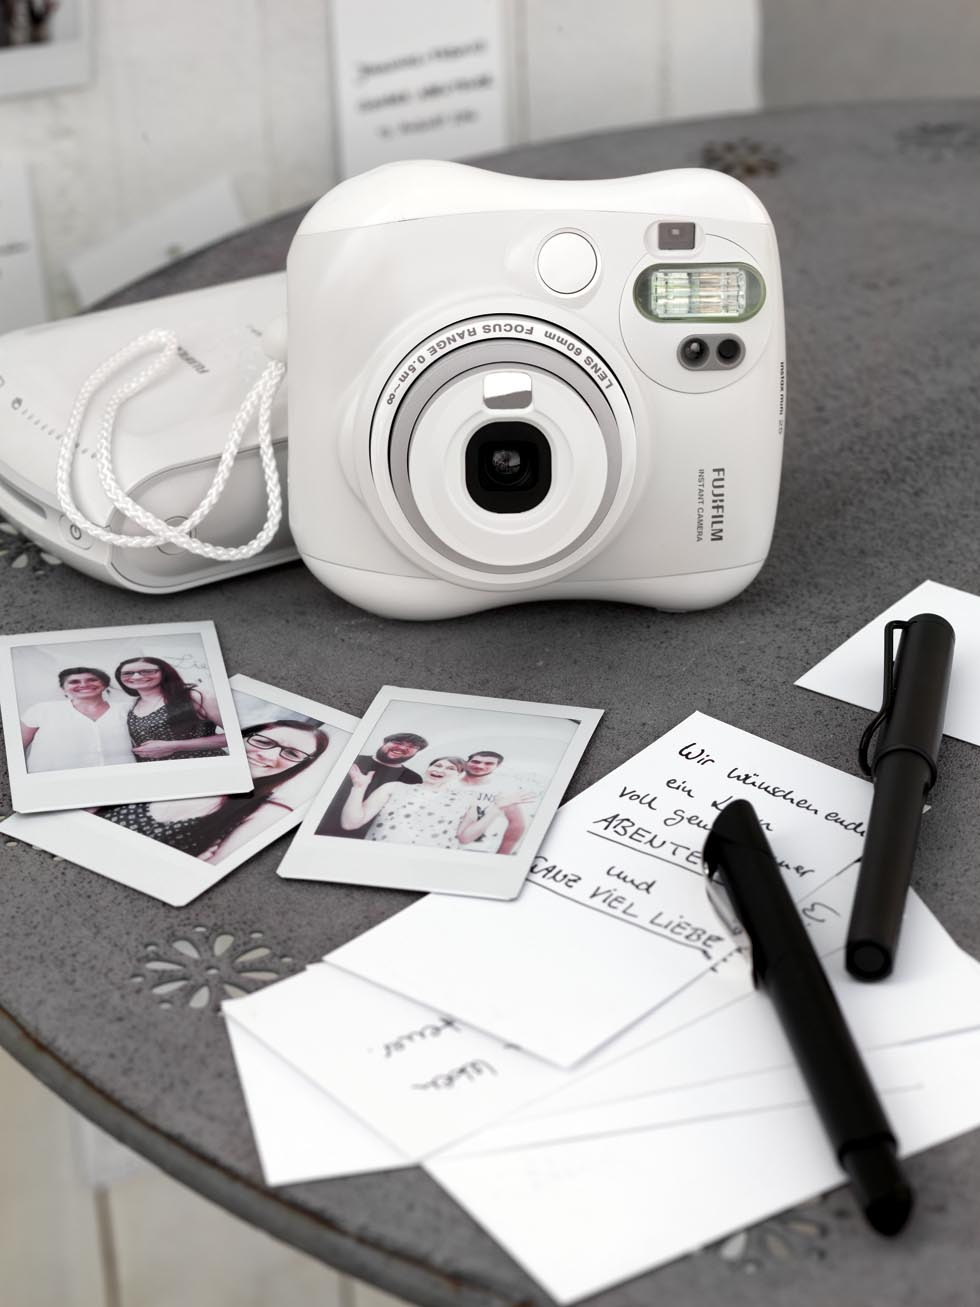 Sofortbildkamera instax 8 mini von Fujifilm